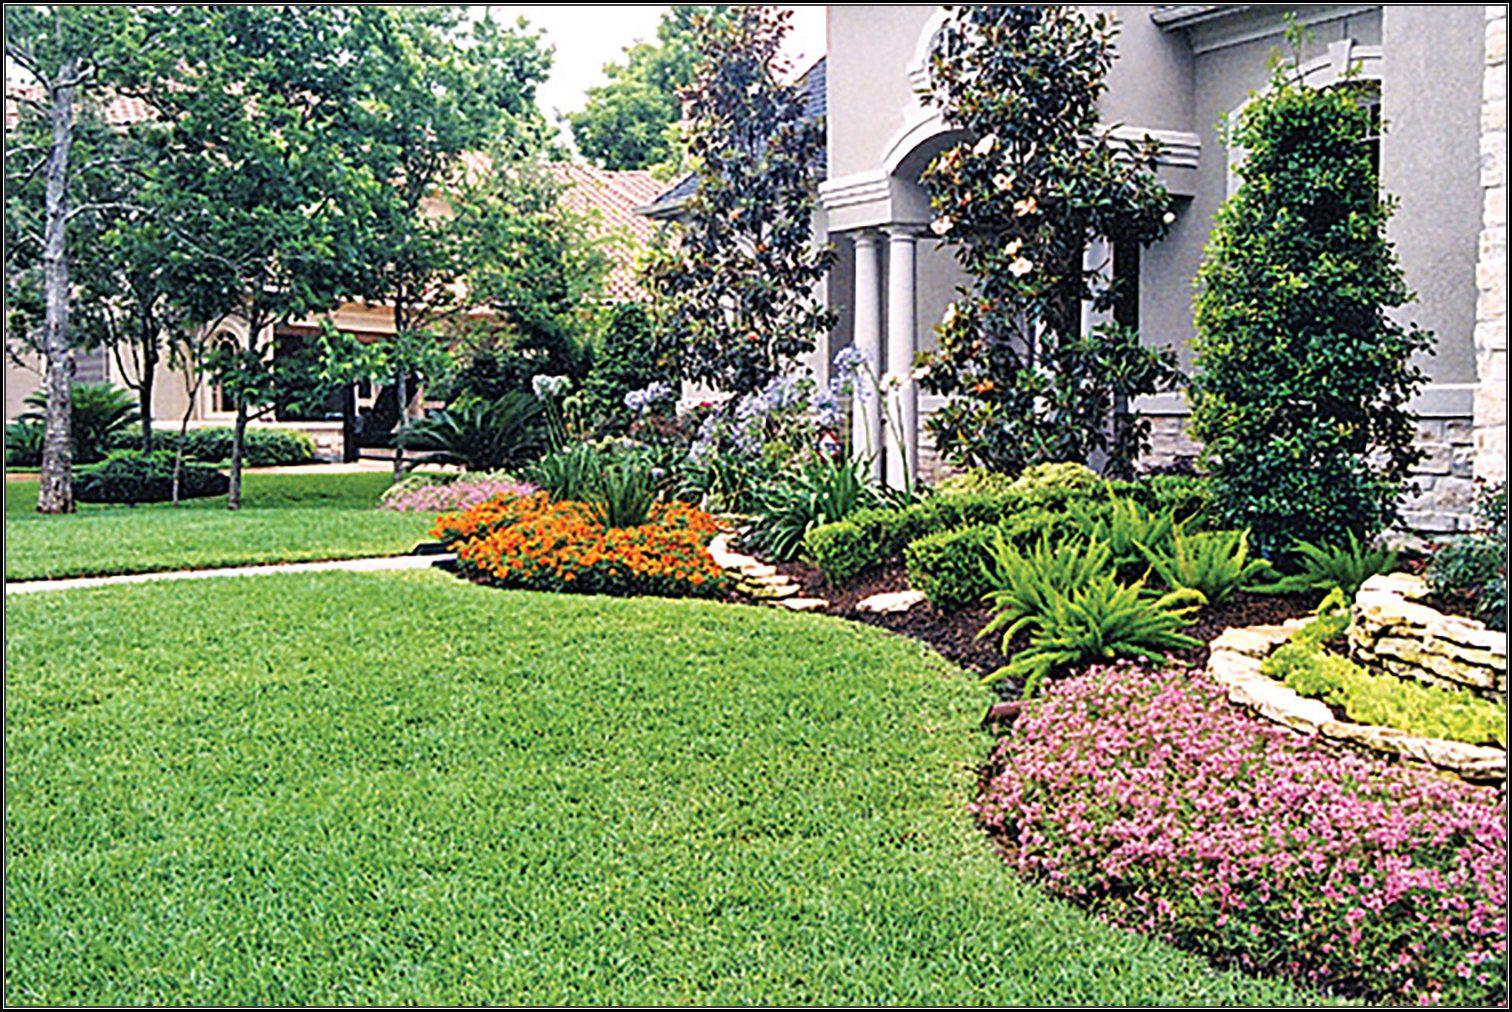 Backyard Landscaping Landscape Design Style The Best Look For Your Yard Diy Landscape Backyard Houston Landscaping Landscape Design Tropical Landscape Design